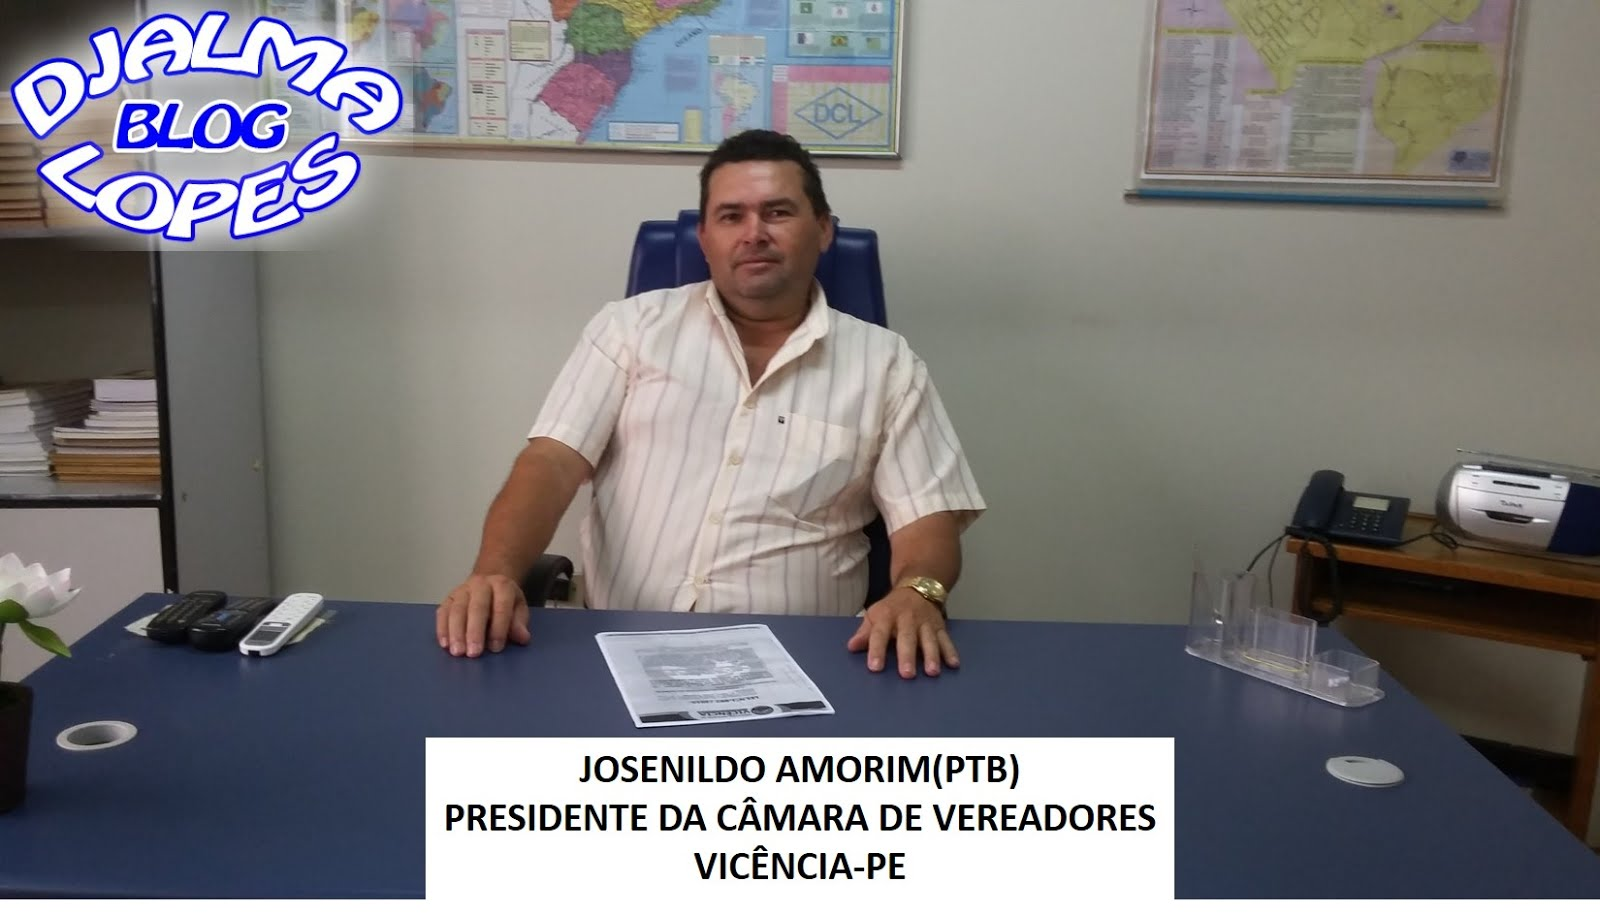 JOSENILDO AMORIM(PTB)